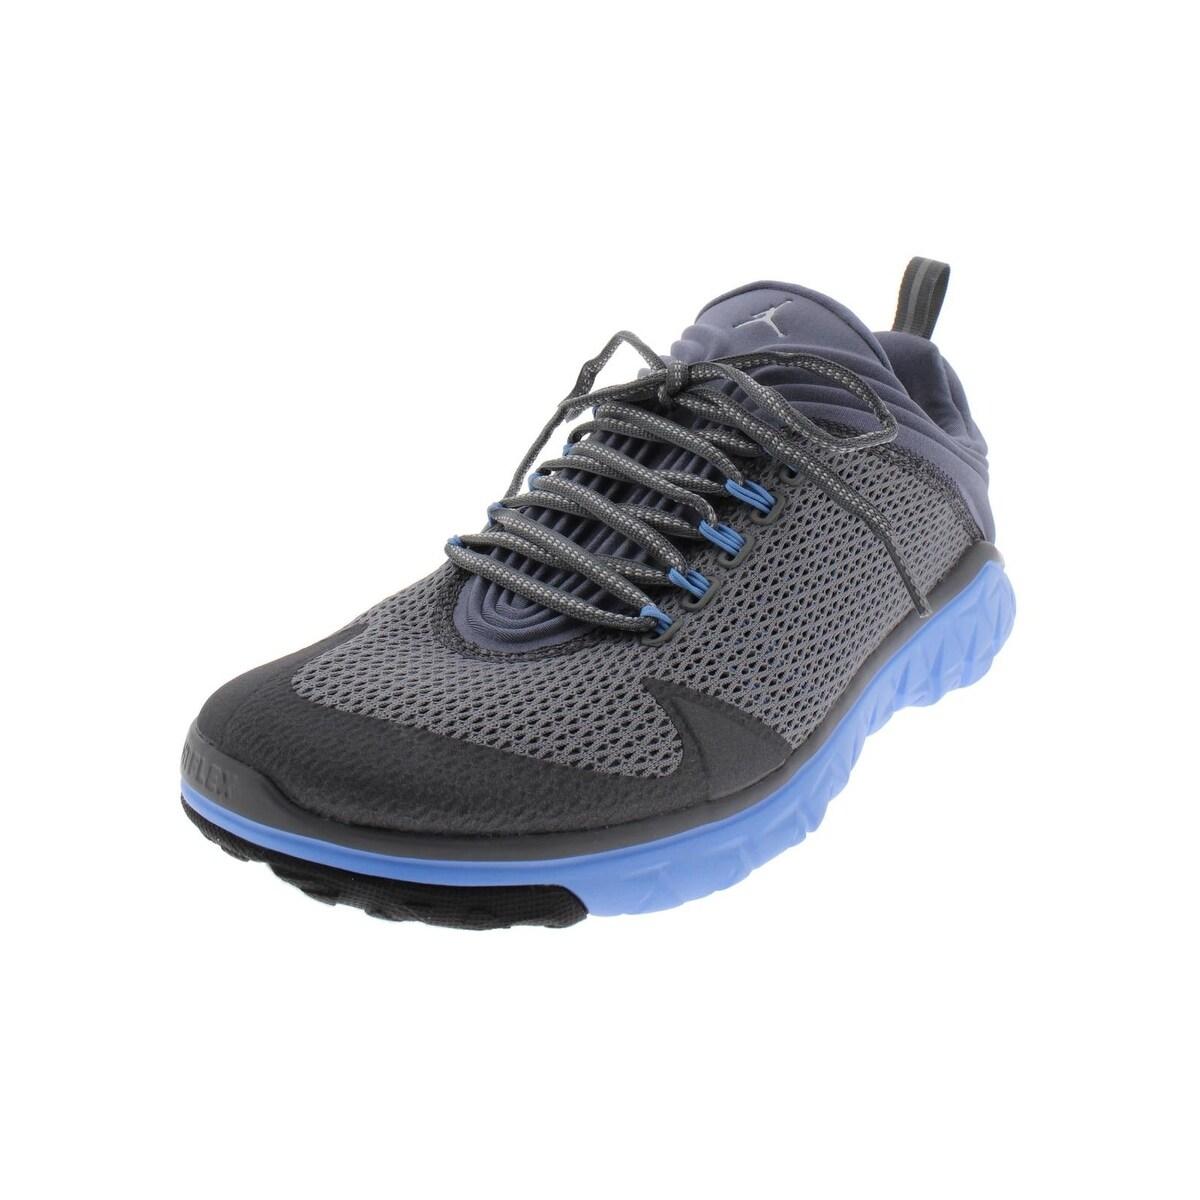 new styles fb603 b03ca Nike Mens Jordan Flight Flex Trainer Basketball Shoes Mesh Low Top